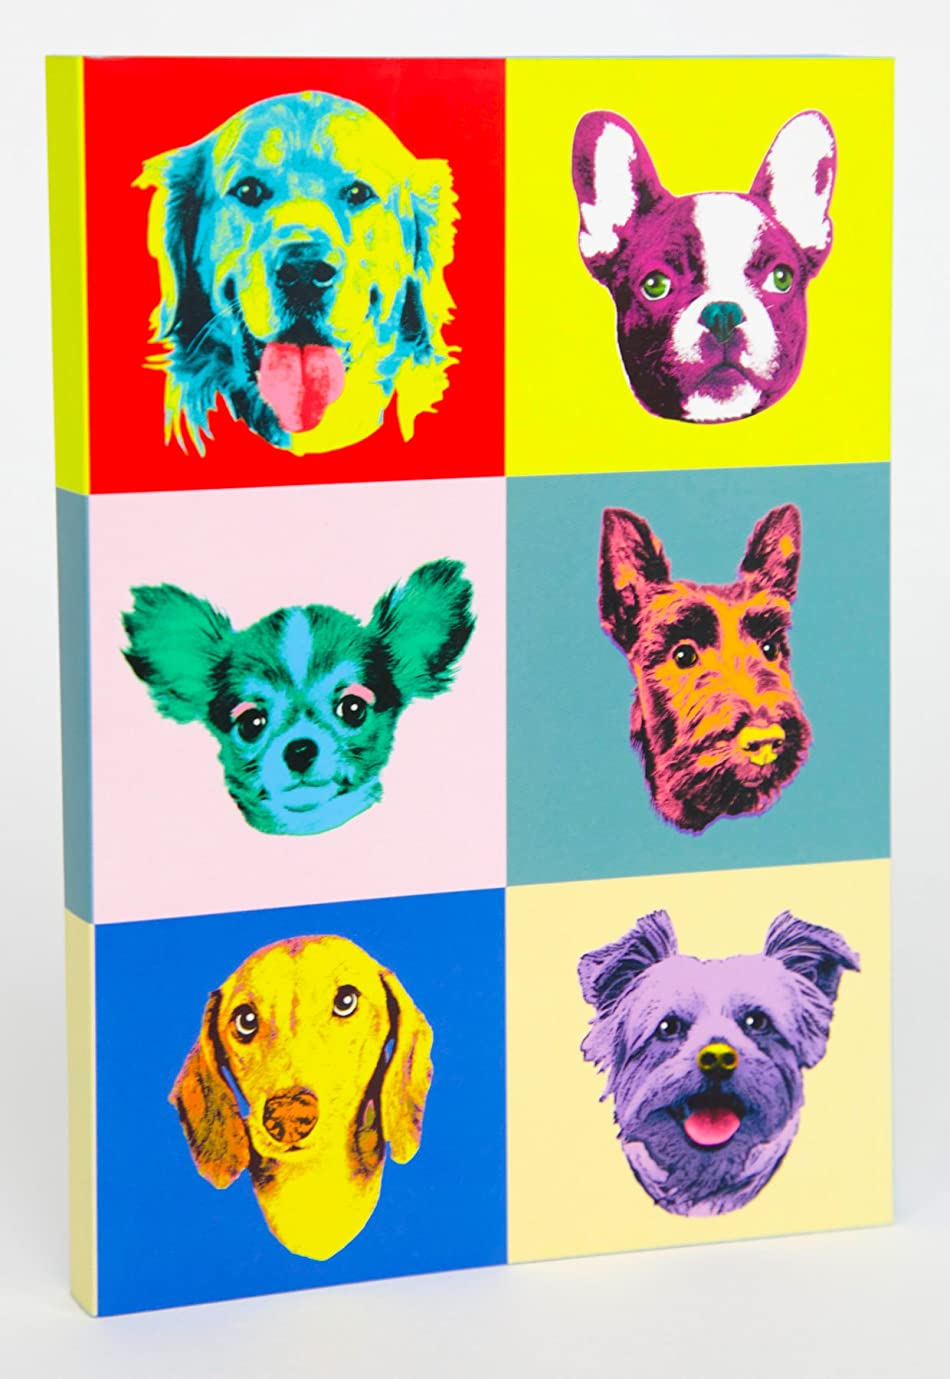 Fringe Studio Andy犬Softcoverジャーナル日記ノートブック、160裏地ページ、5?x 7インチ